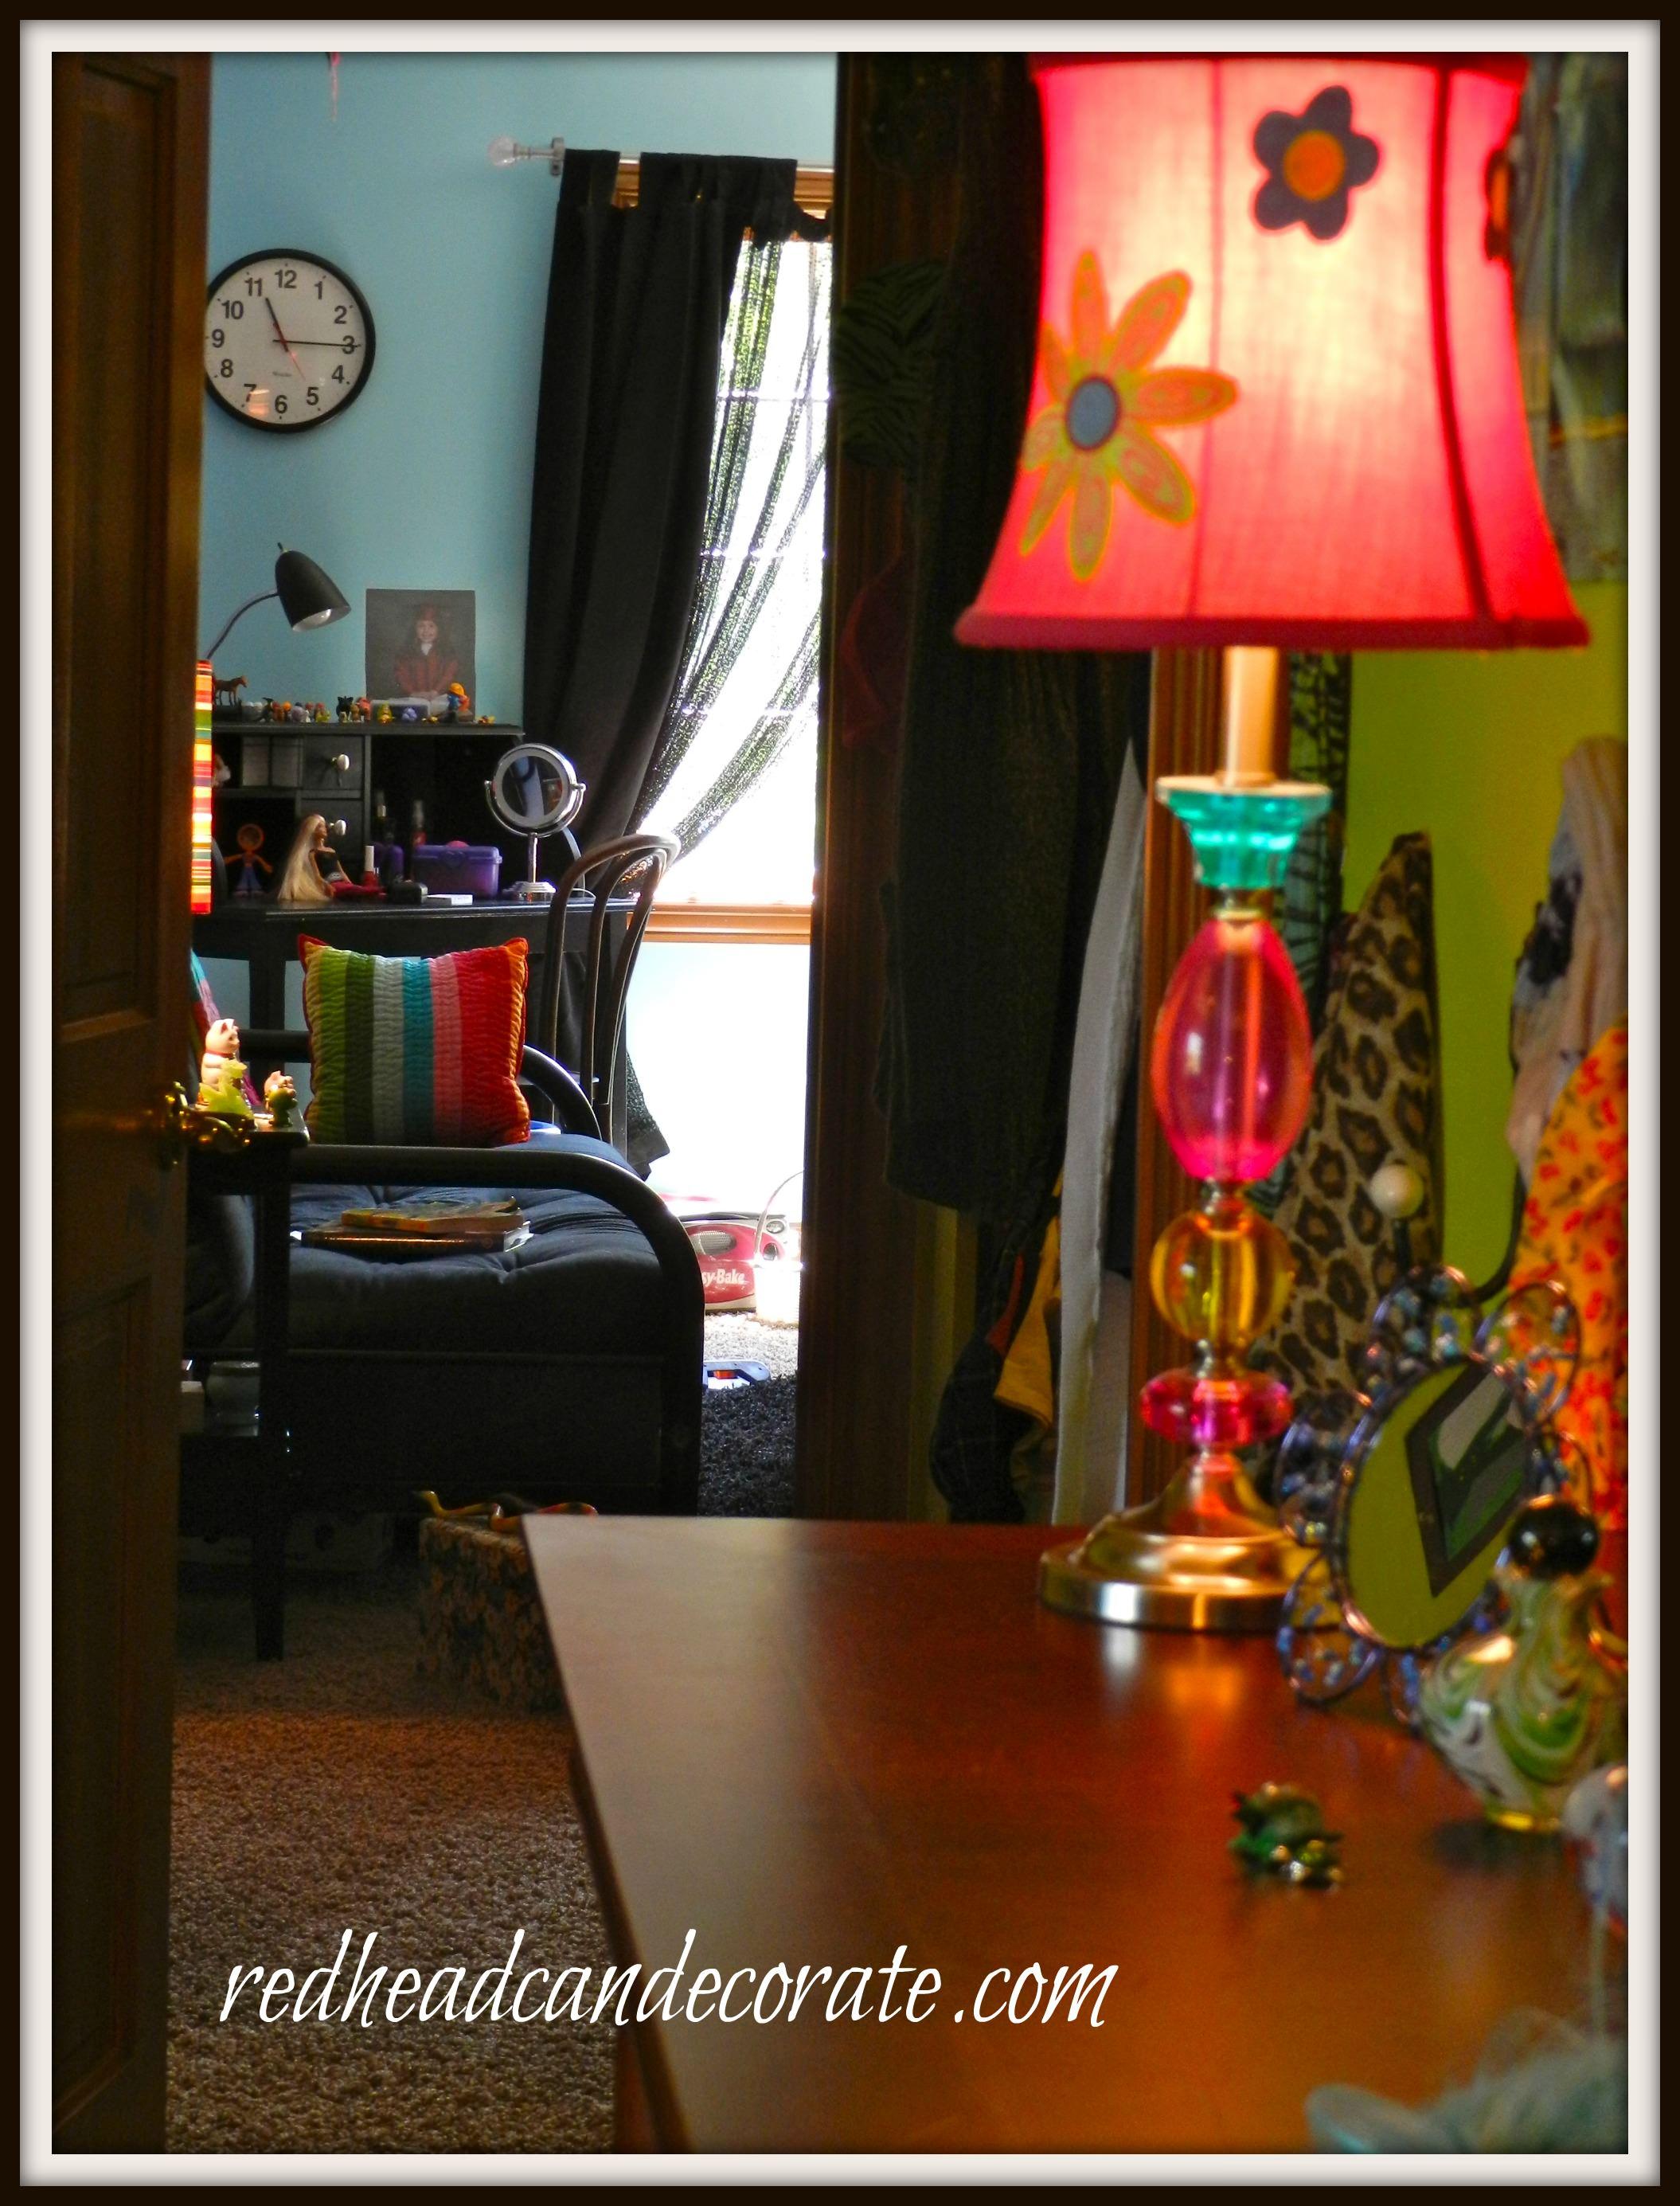 Daphne's Room 5